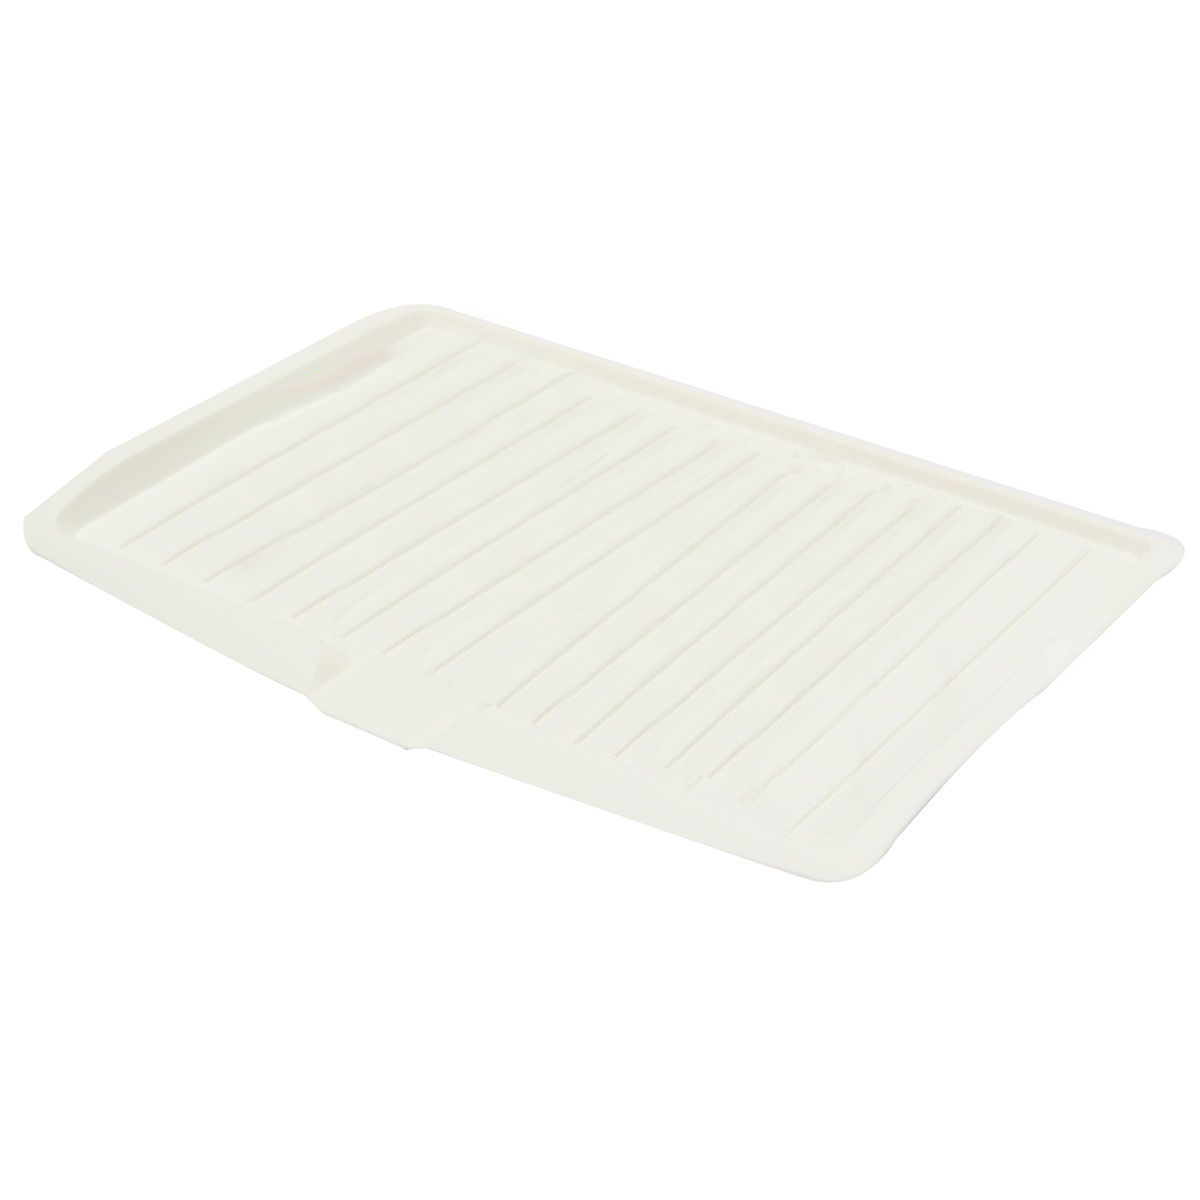 PHFU Plastic Dish Drainer Drip Tray Plate Cutlery Rack Kitchen Sink ...